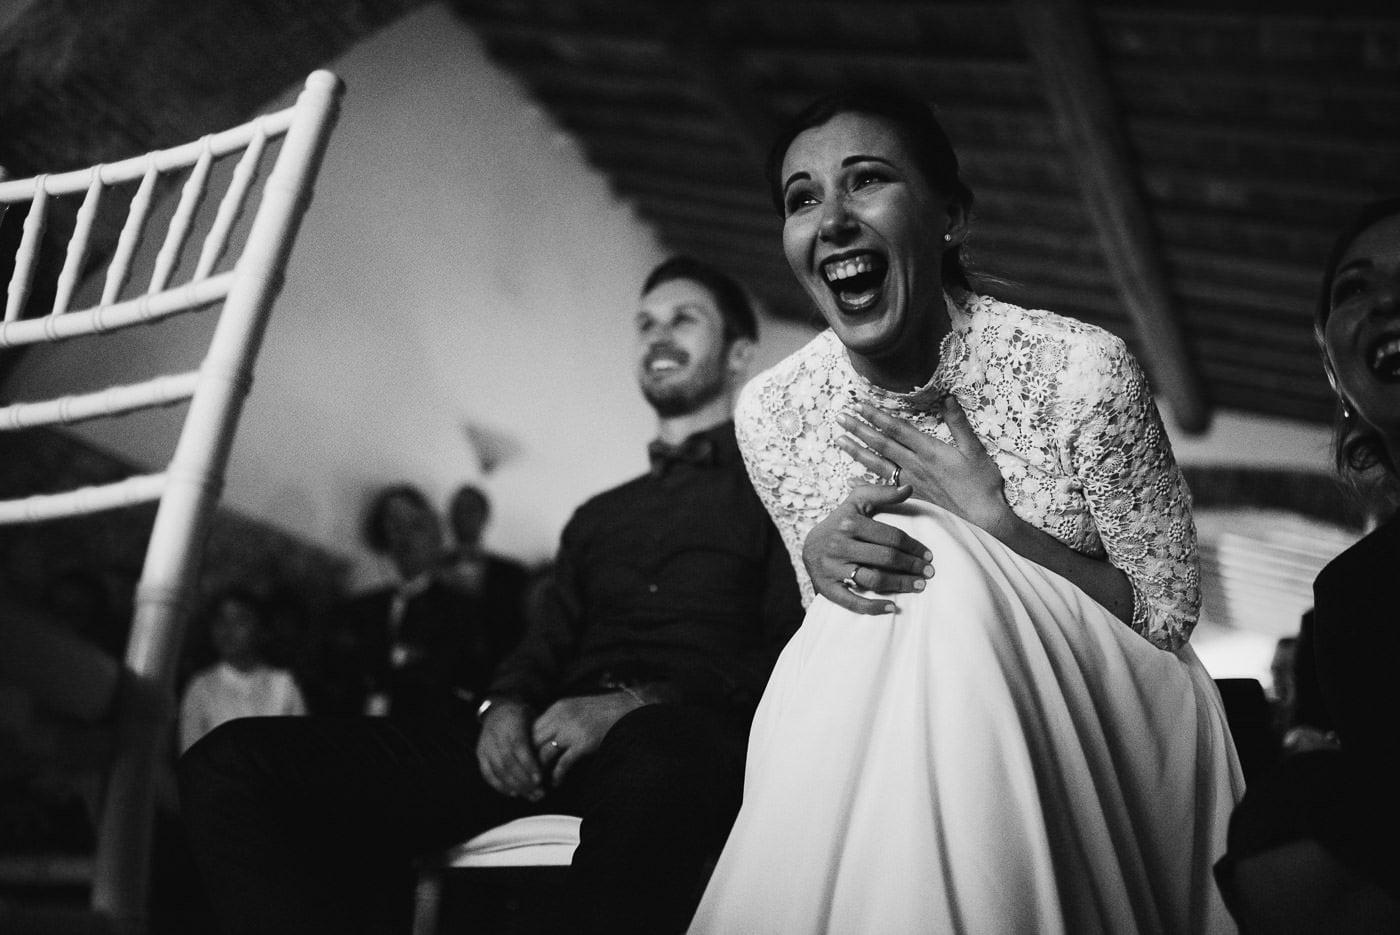 Matrimonio Giulia & Alessandro 28_12 – Alessio Nobili Photographer-64